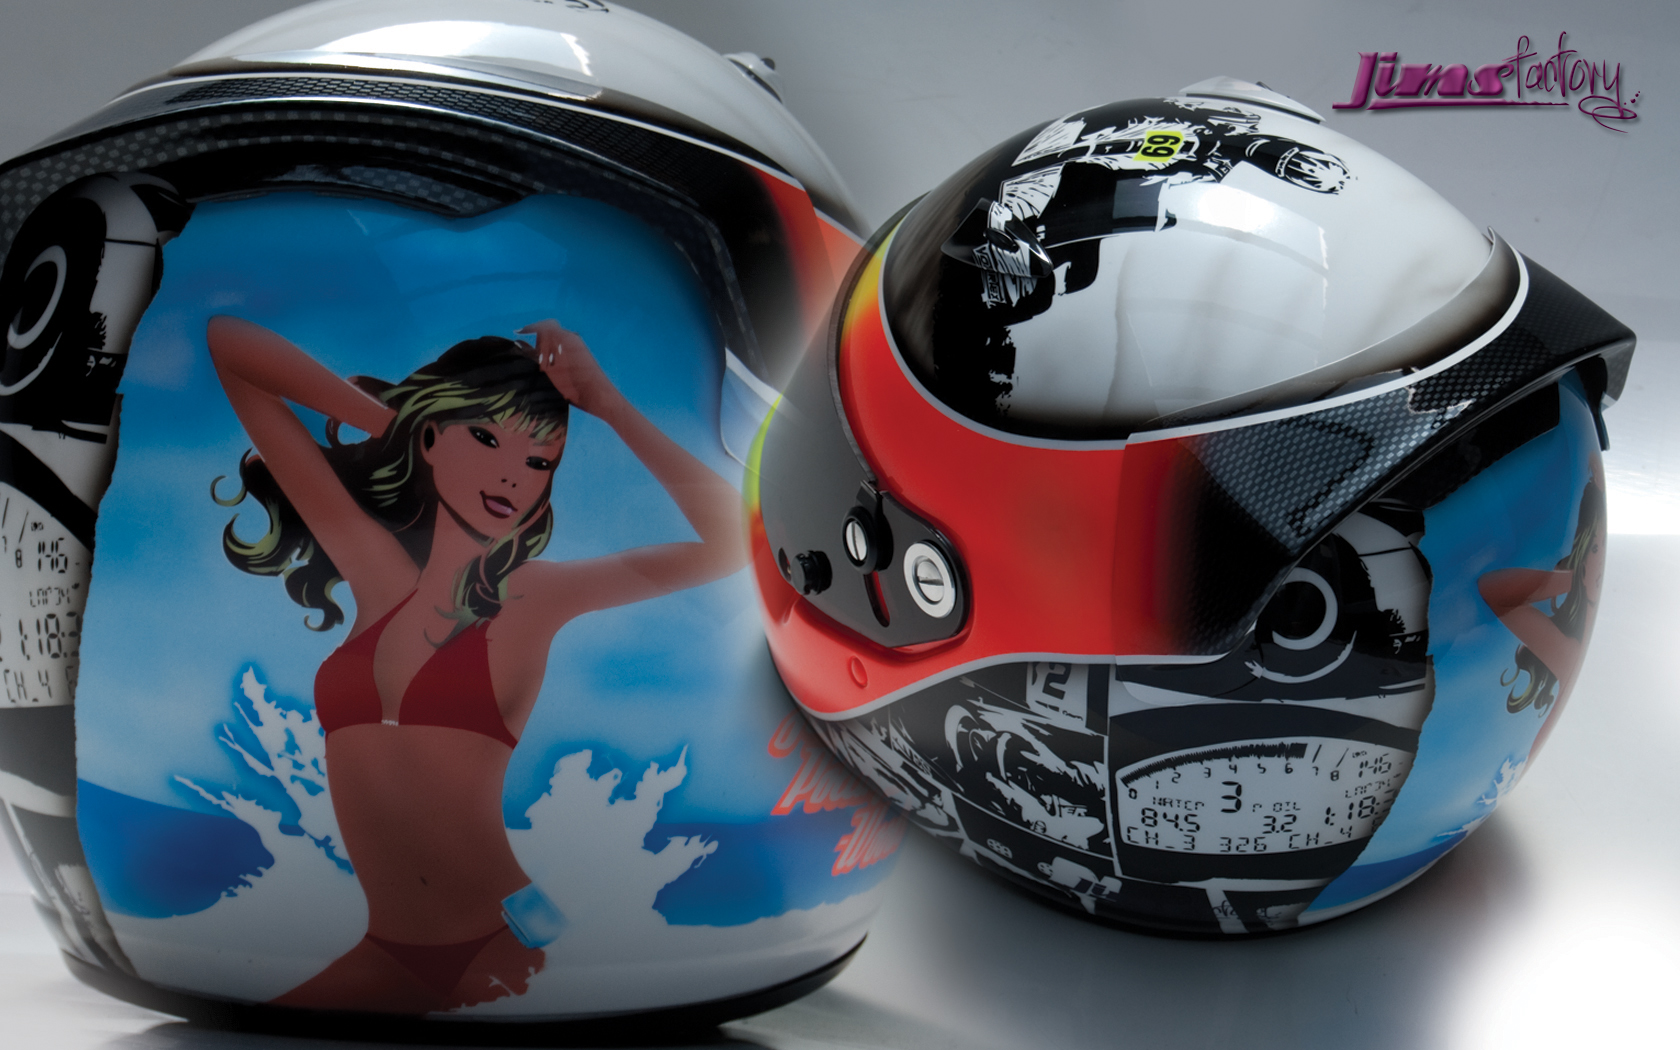 Jims Factory Custom Helmet Wallpaper